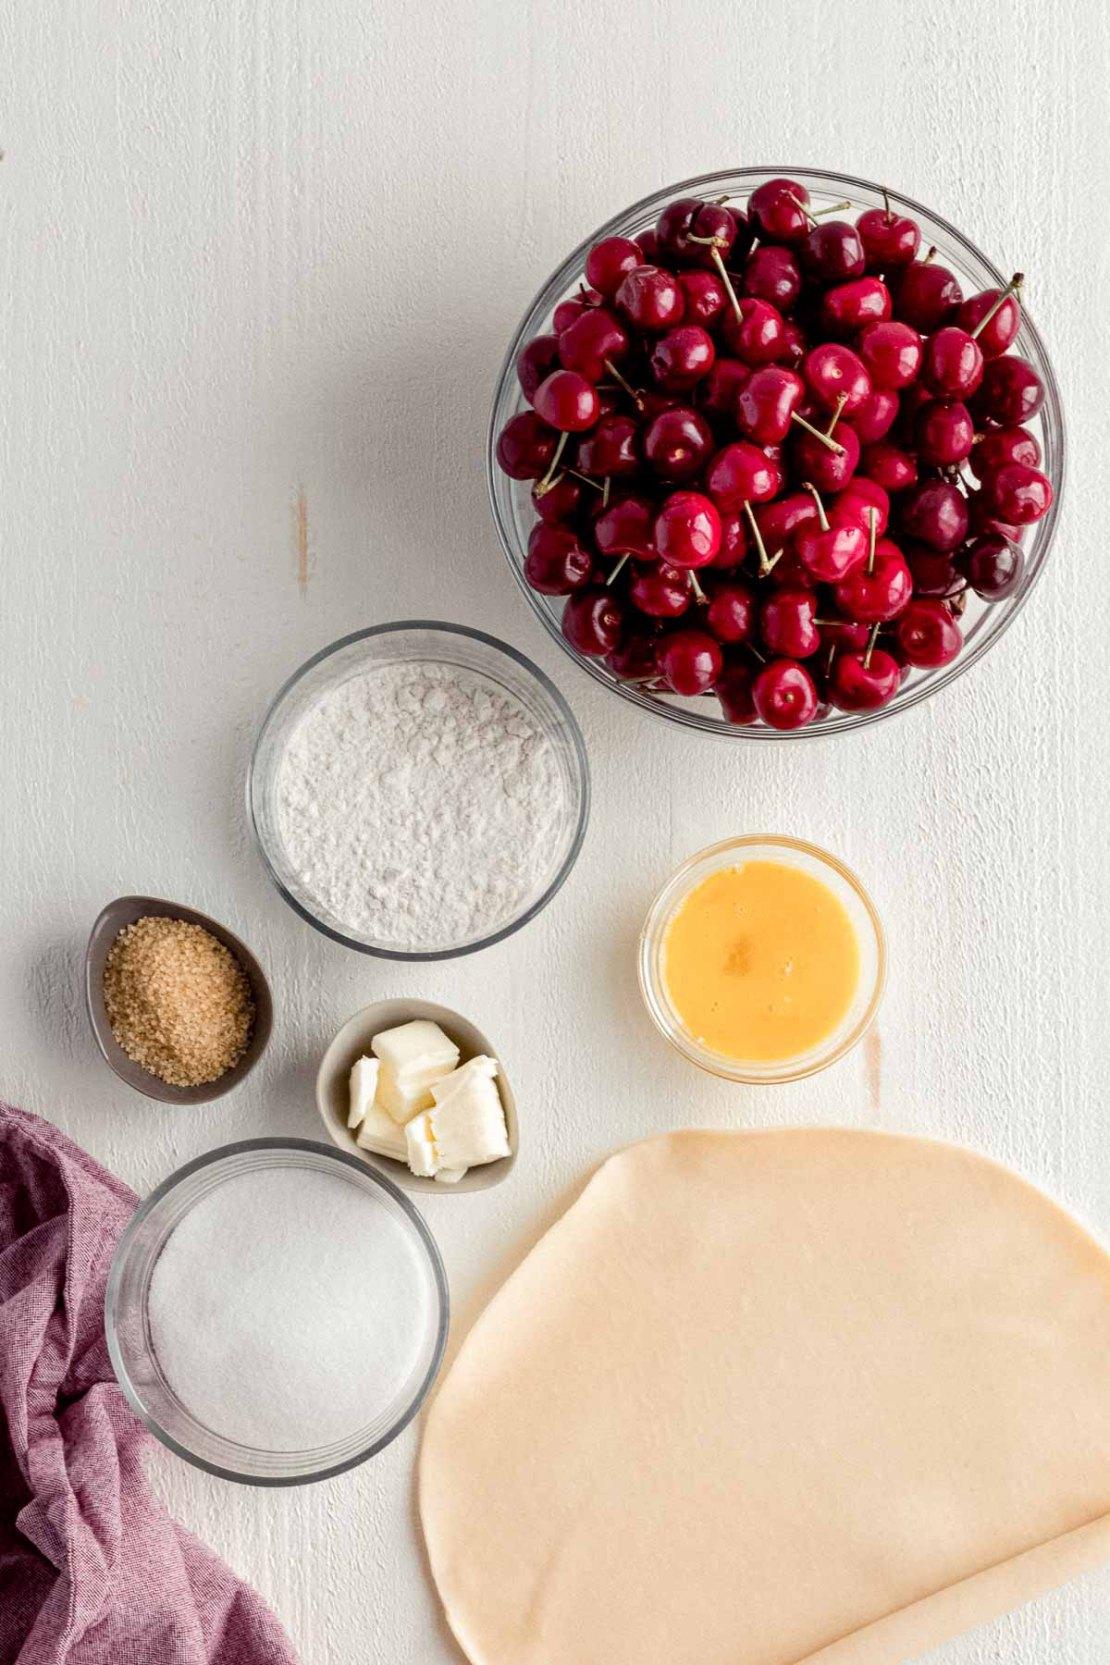 Cherry Pie ingredients in prep bowls